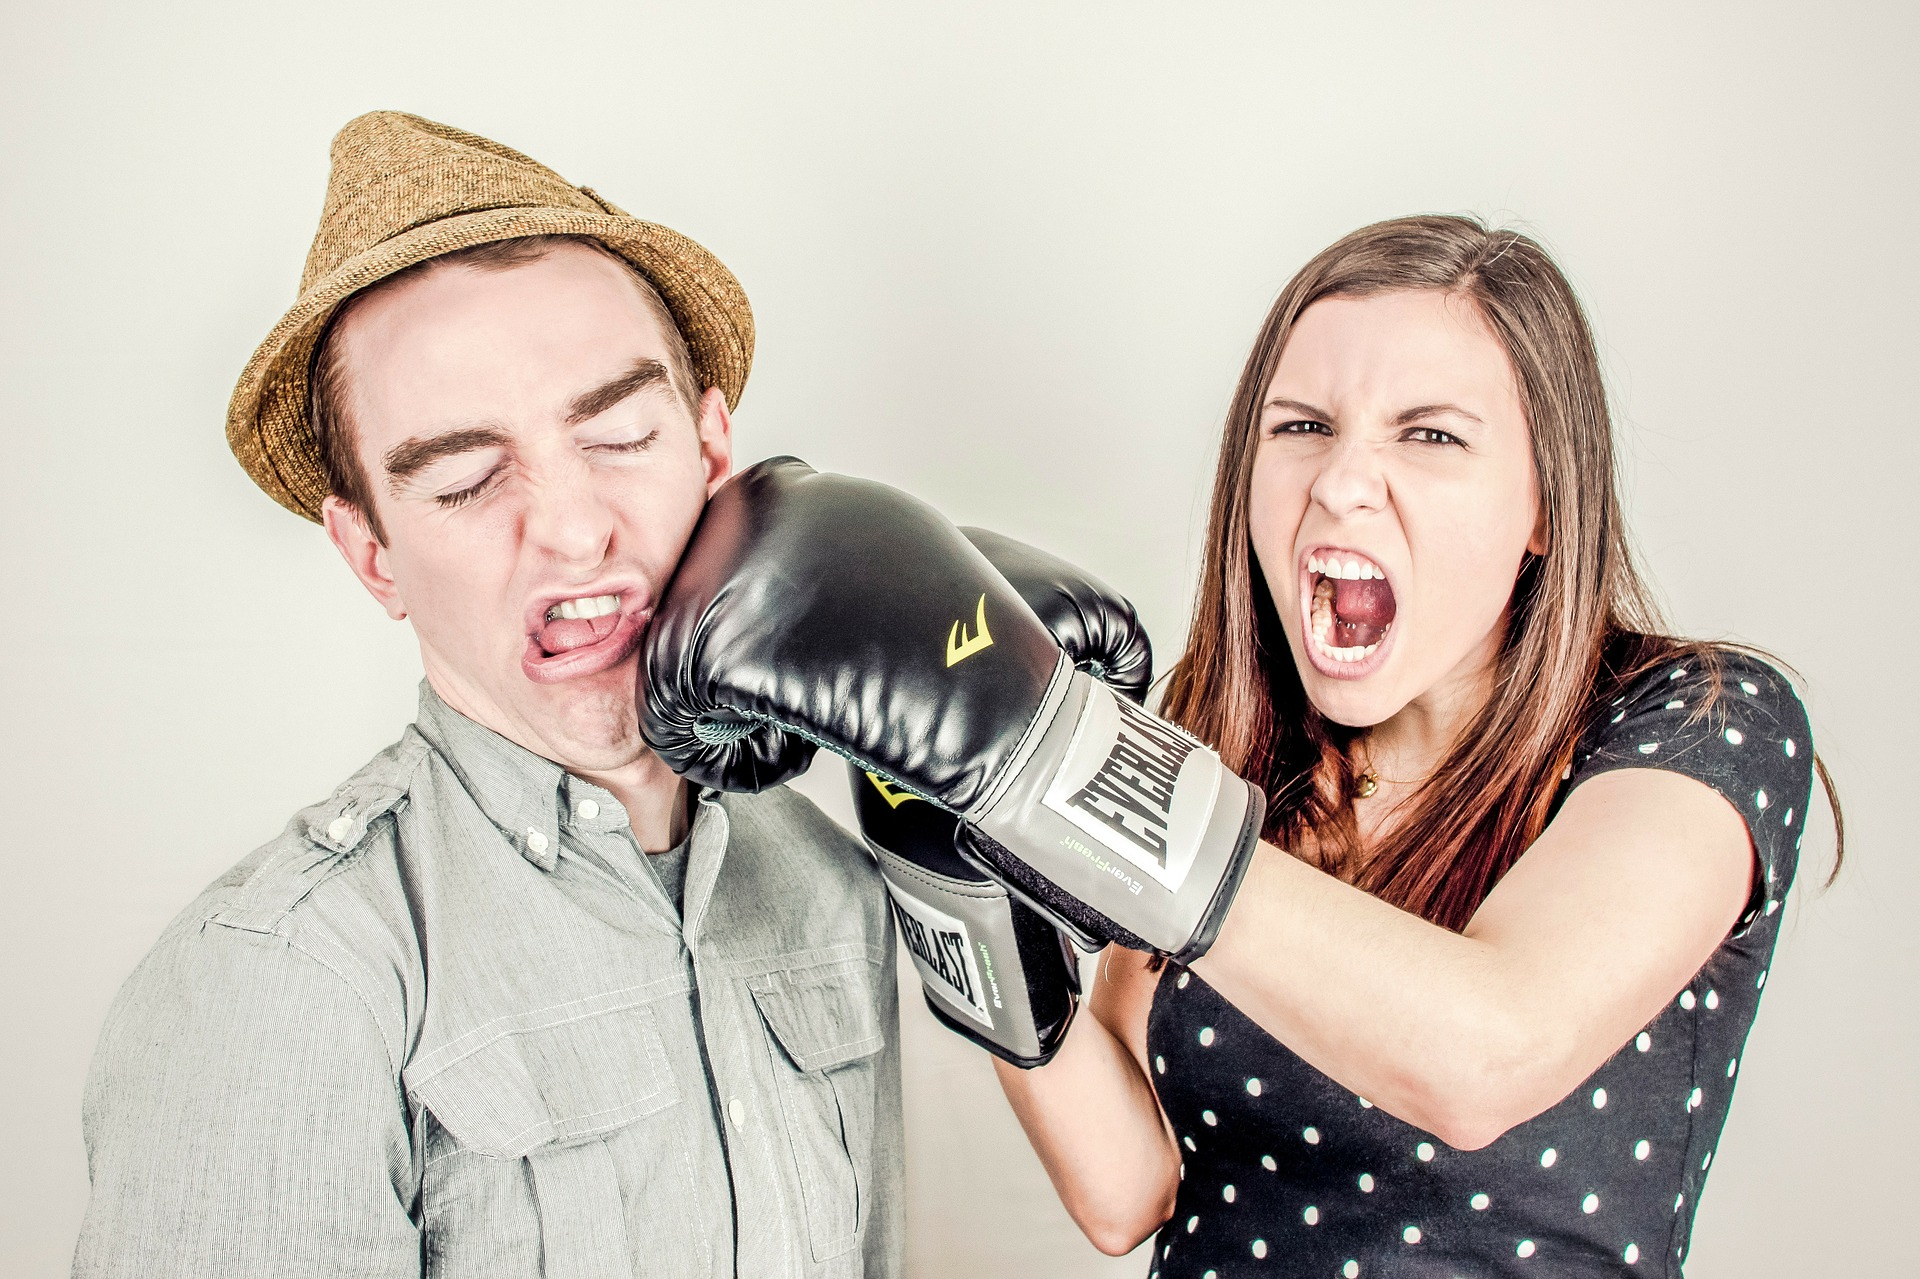 Pasivno-agresivno ponašanje na poslu